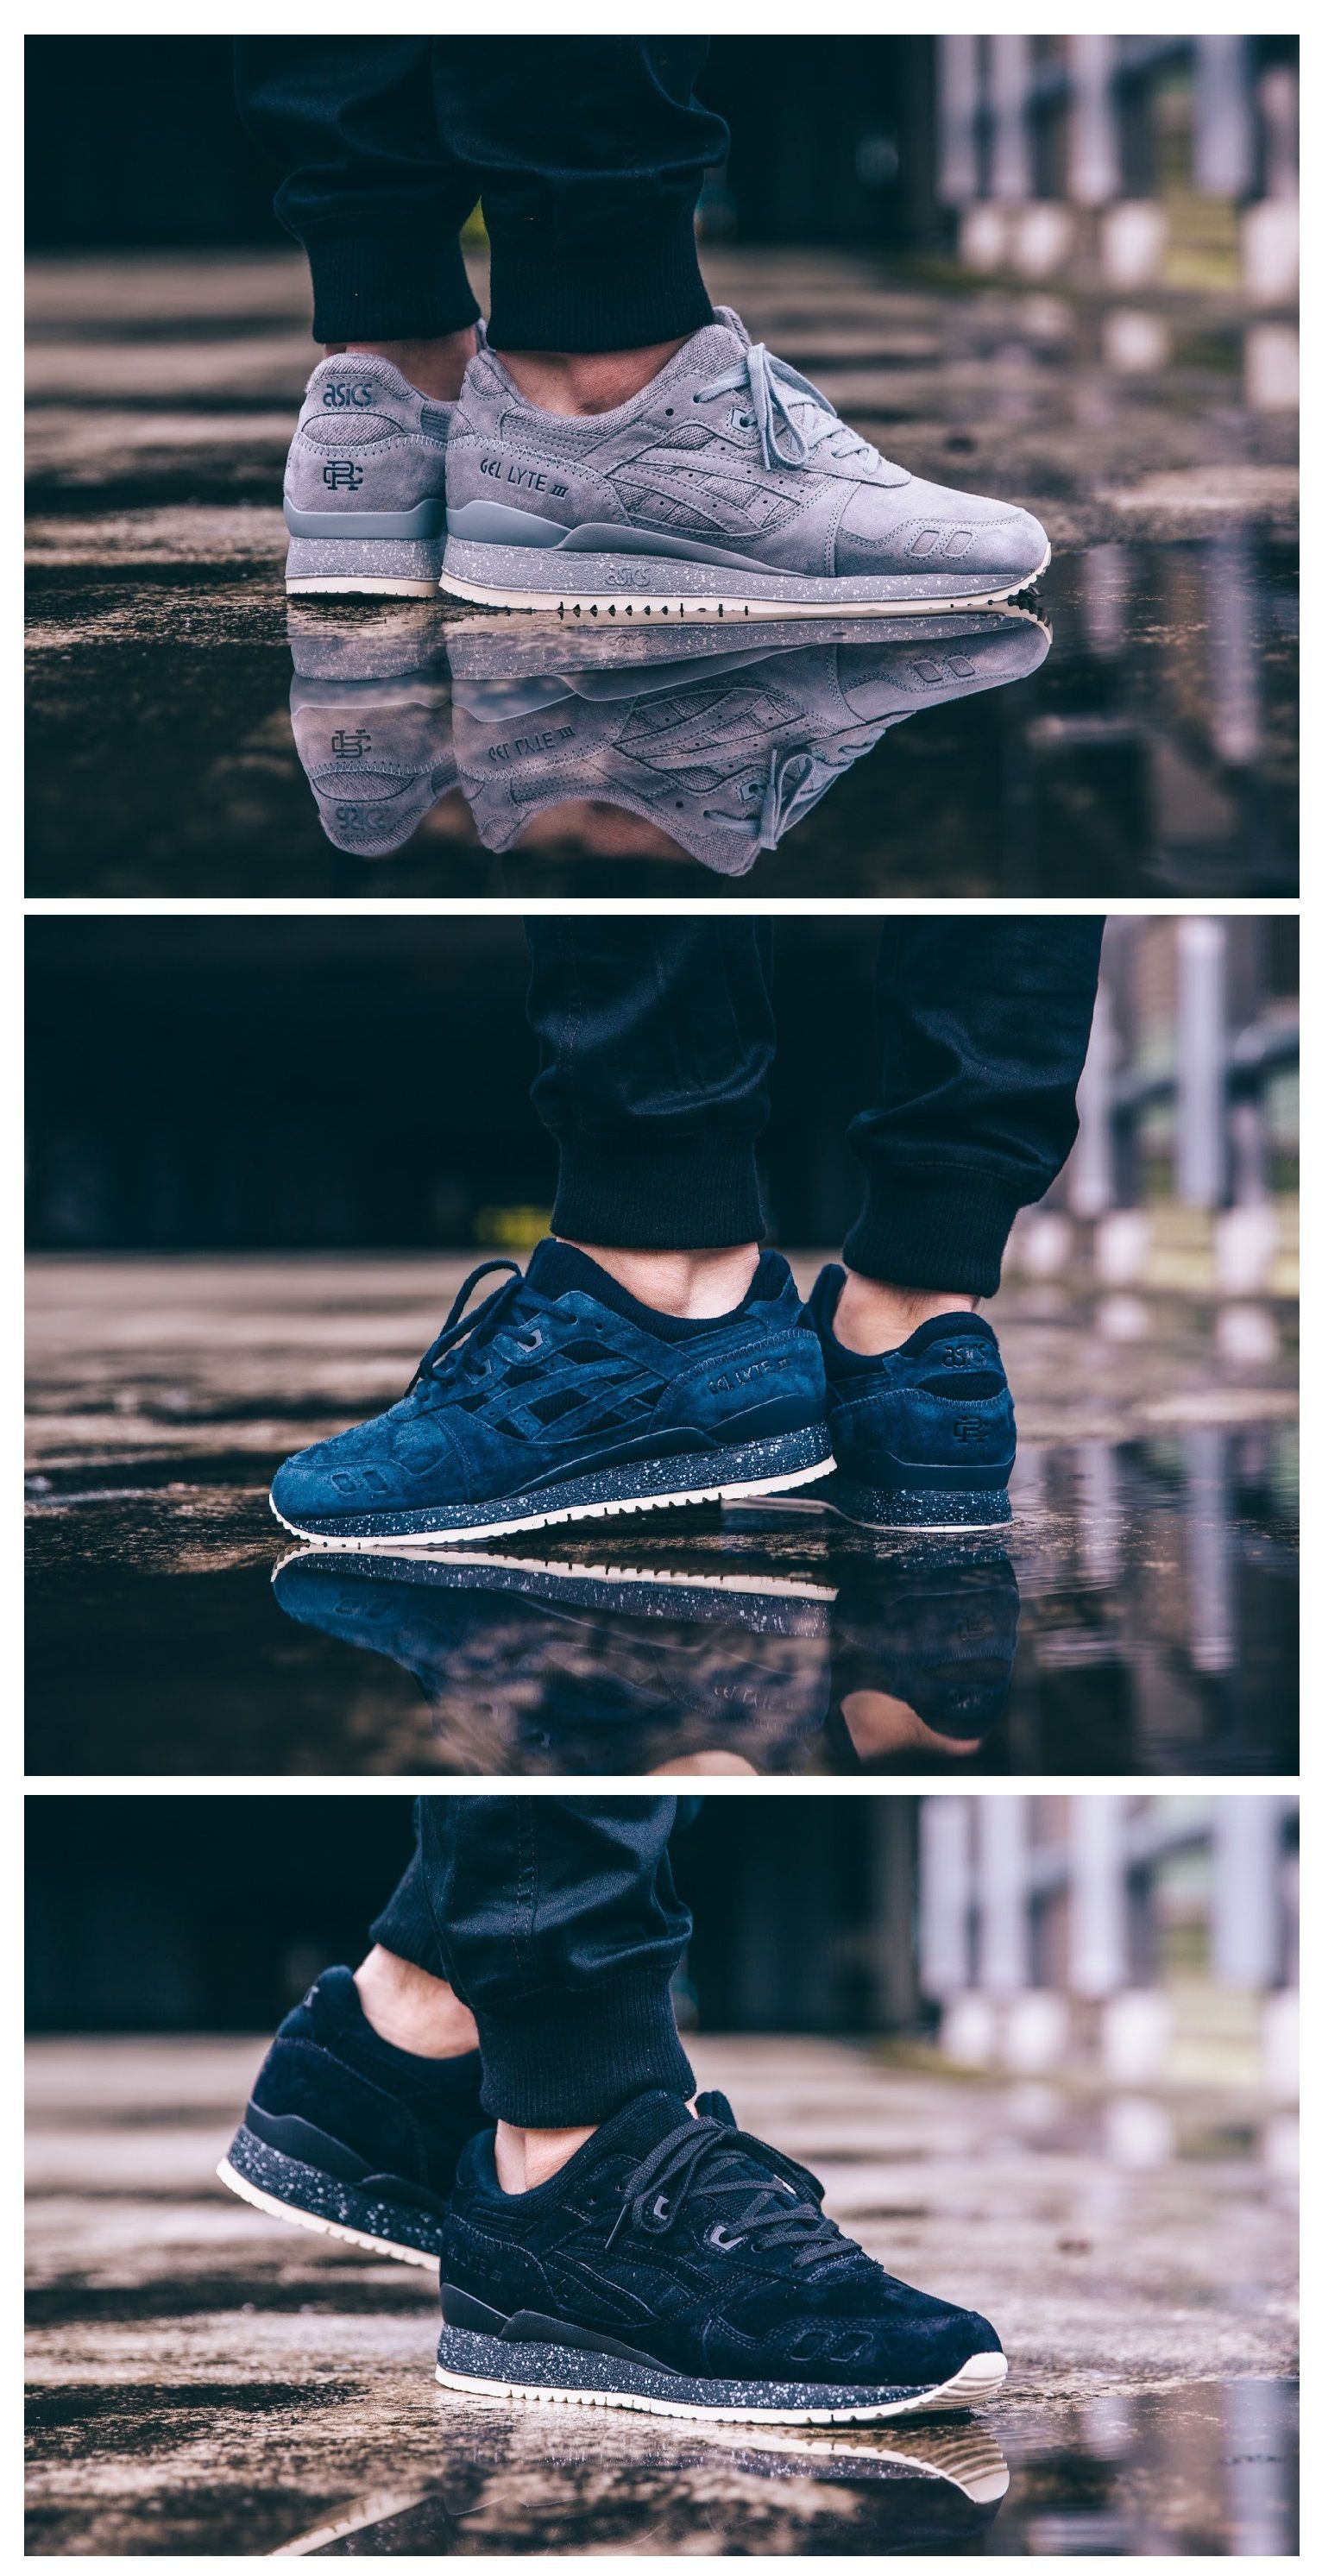 Pin by Carlos Moina on Moda de Hombre | Sneakers nike